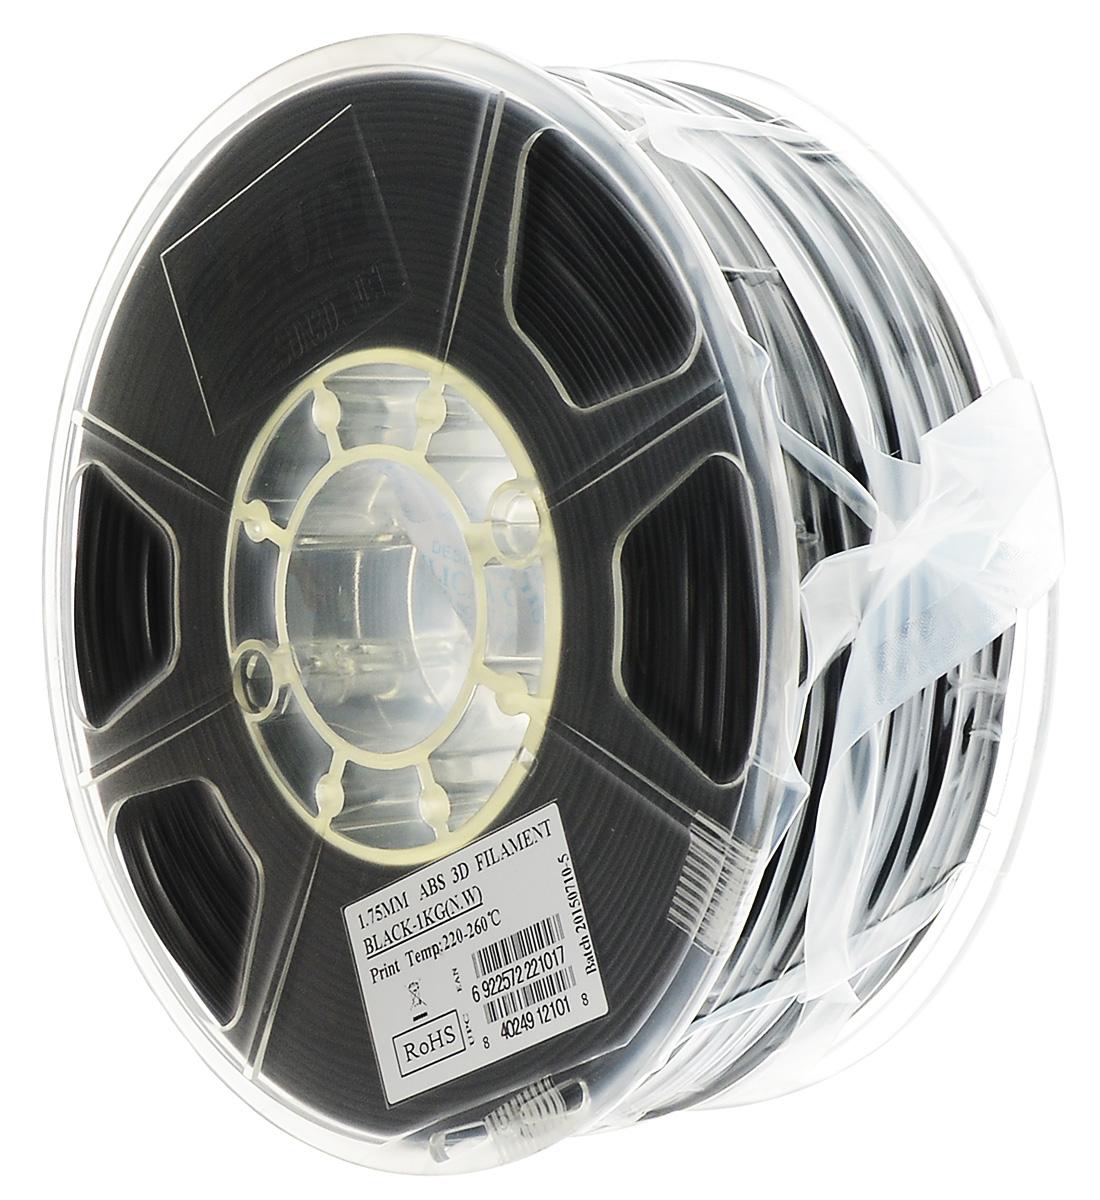 ESUN пластик ABS в катушке, Black, 1,75 ммABS175B1ESUN ABS175B1 - катушка ABS-пластика черного цвета для3D печати. Толщина пластика составляет 1,75 мм.